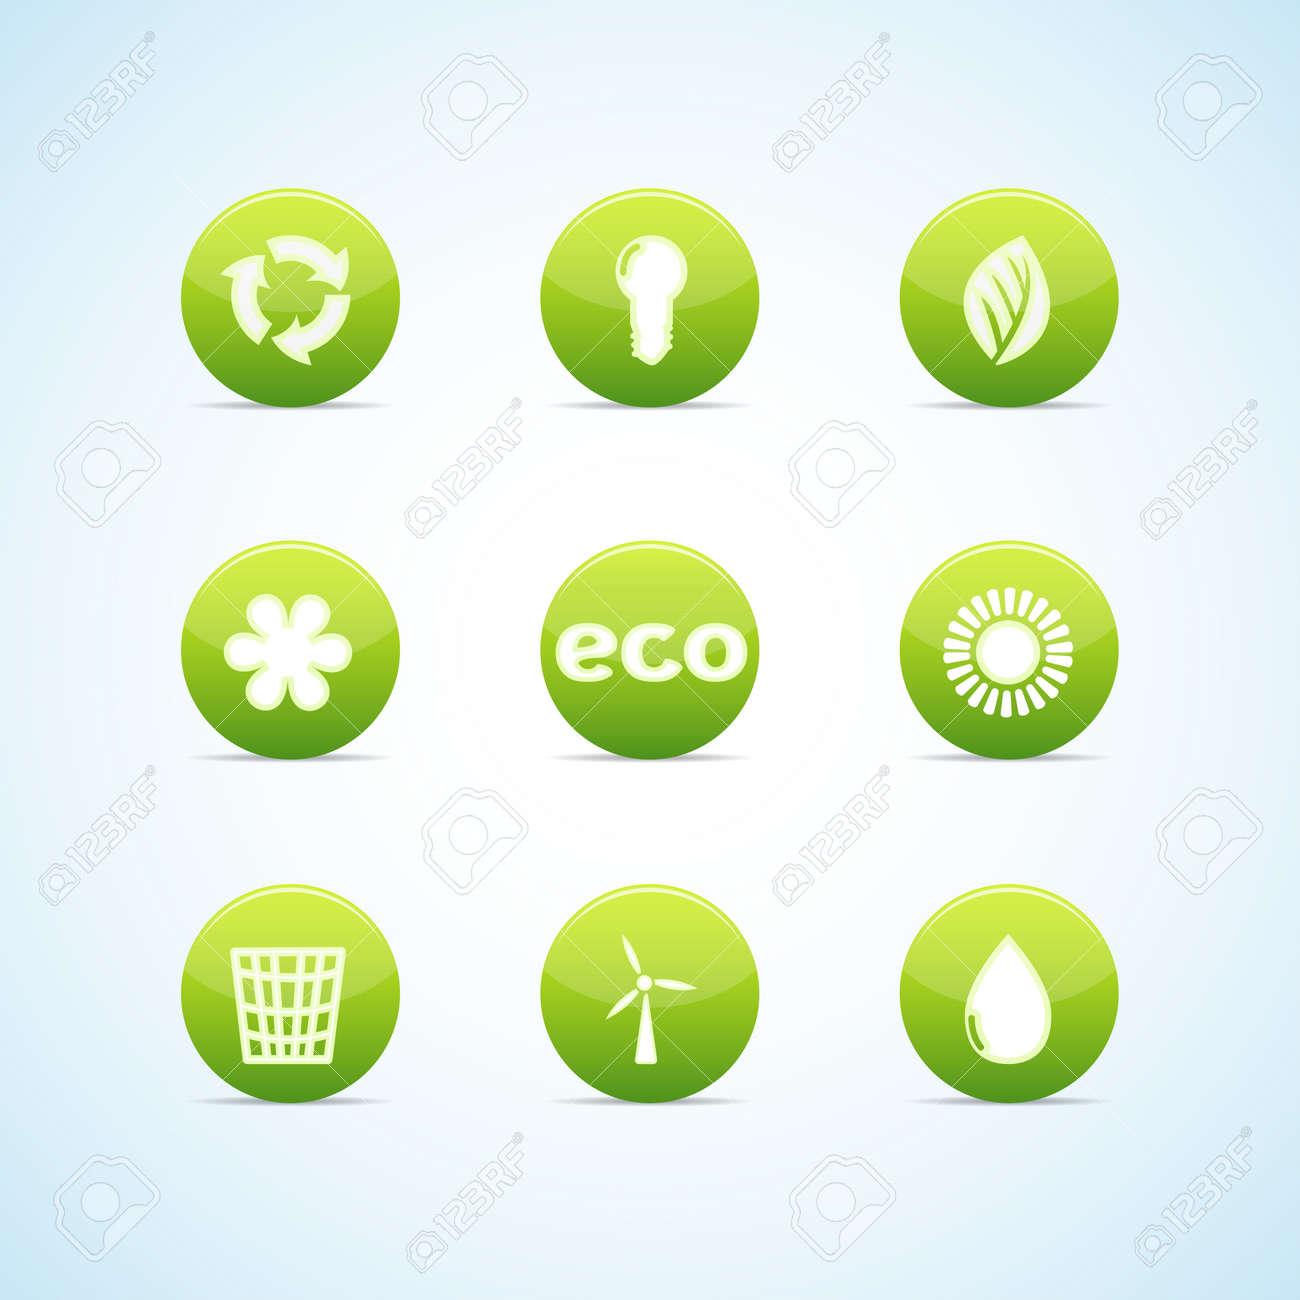 Ecology icon set for green design Stock Vector - 12945646